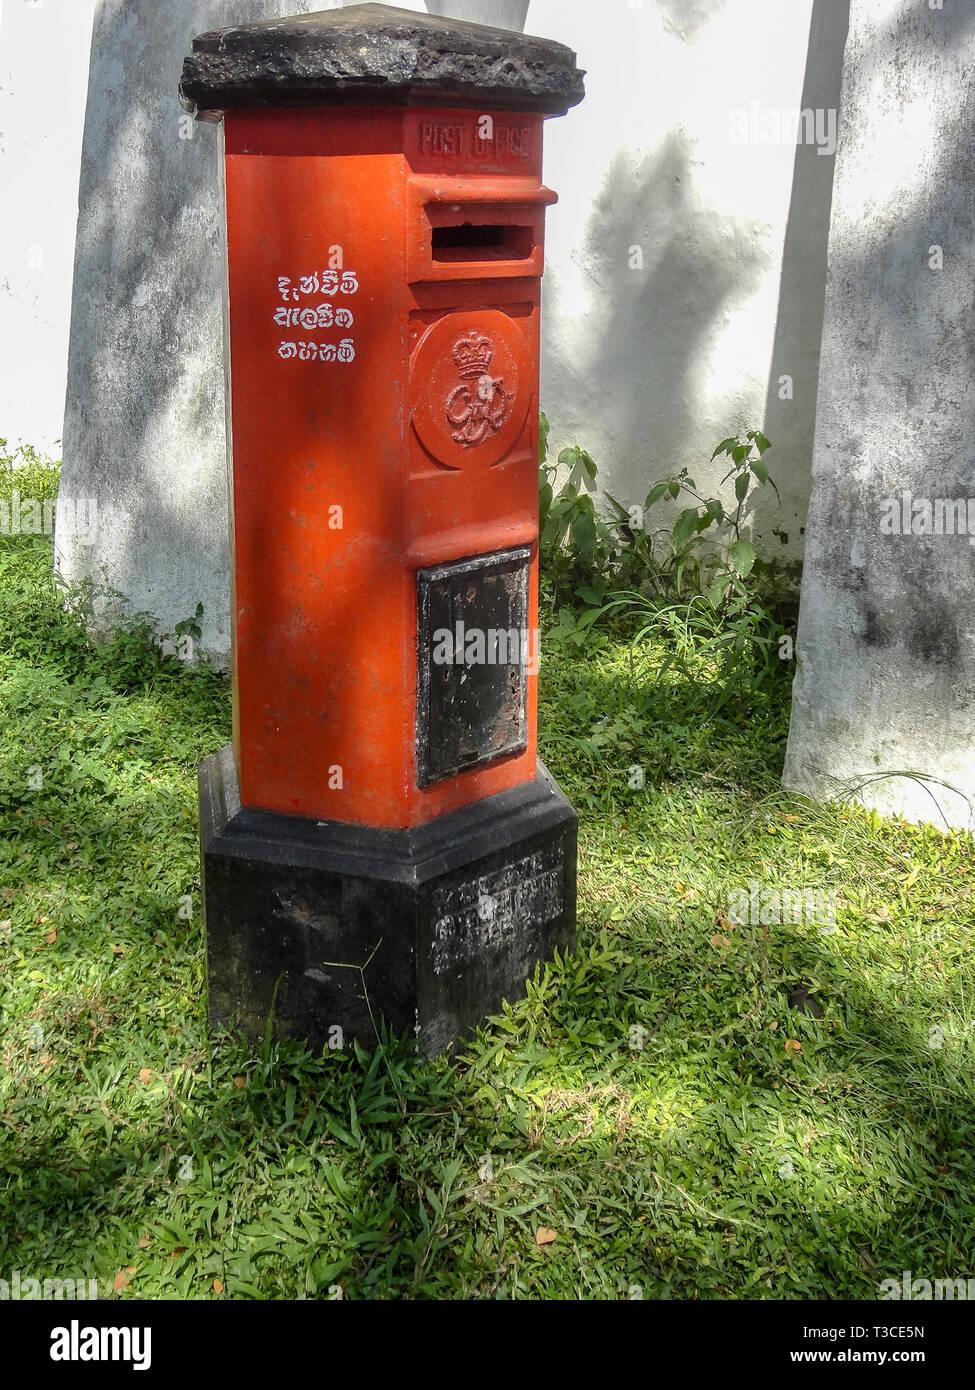 Postbox Galle Sri Lanka. - Stock Image